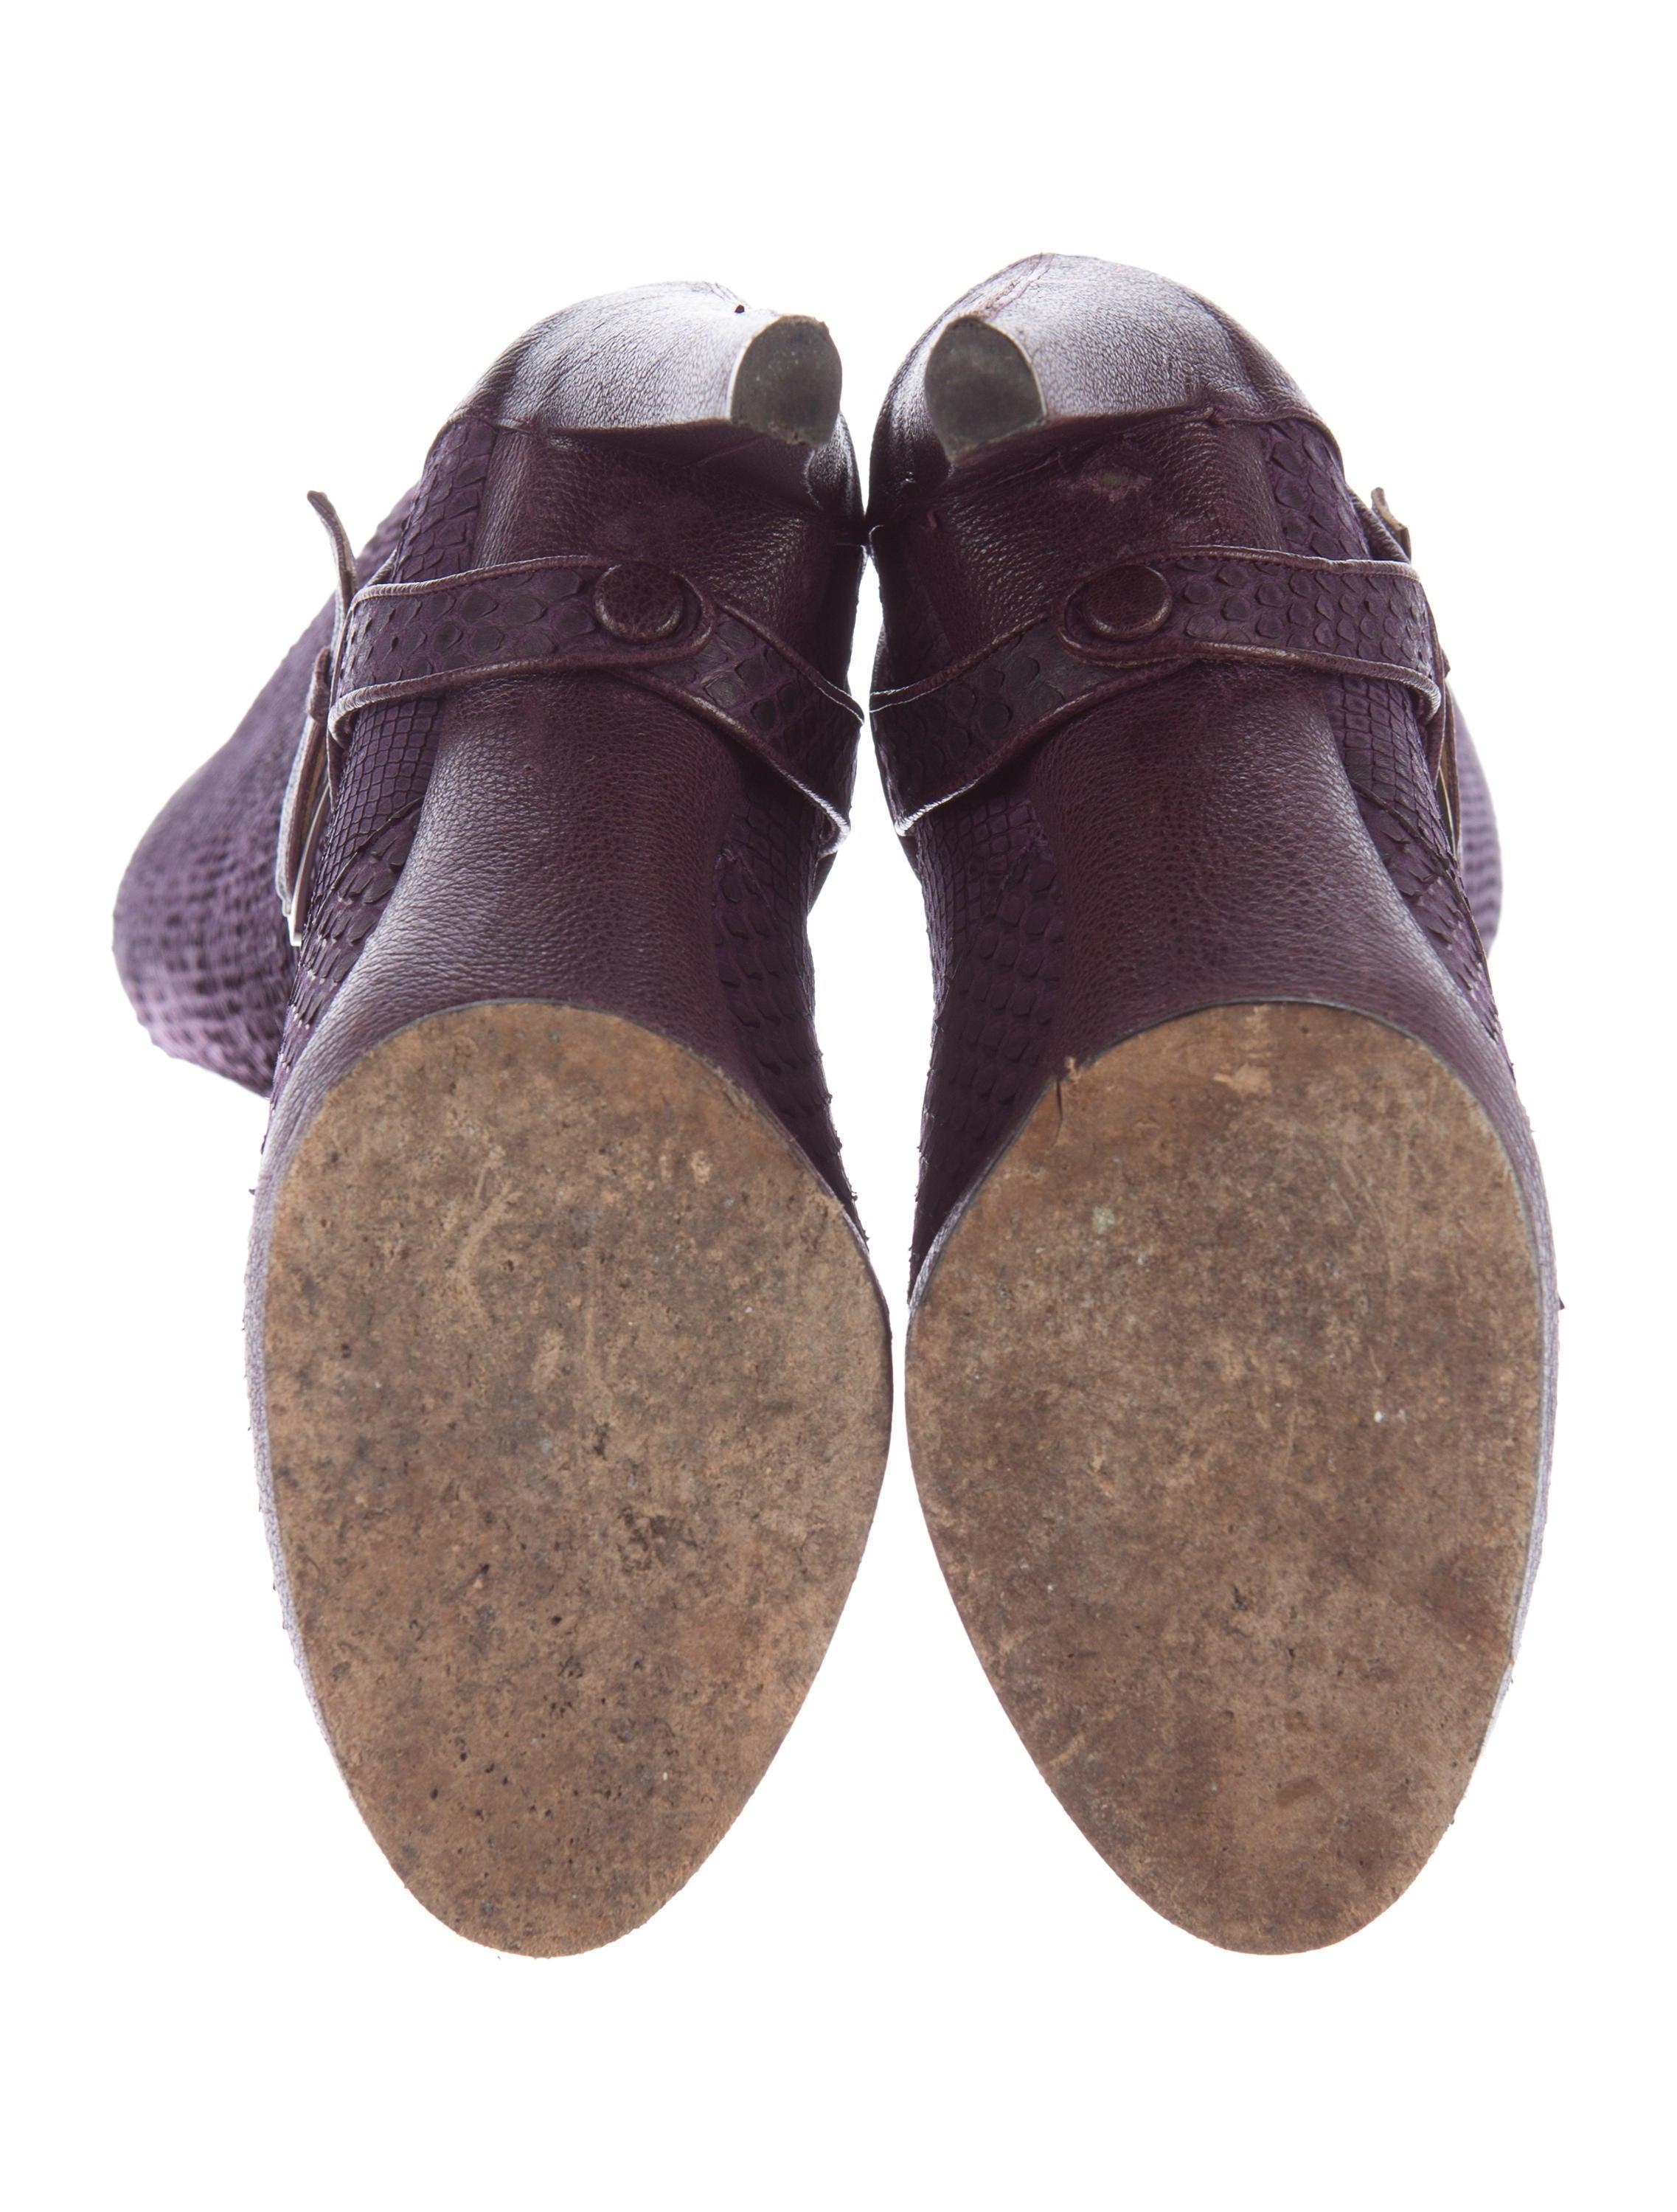 Christian Dior Tsar Python Boots Shoes Chr57293 The